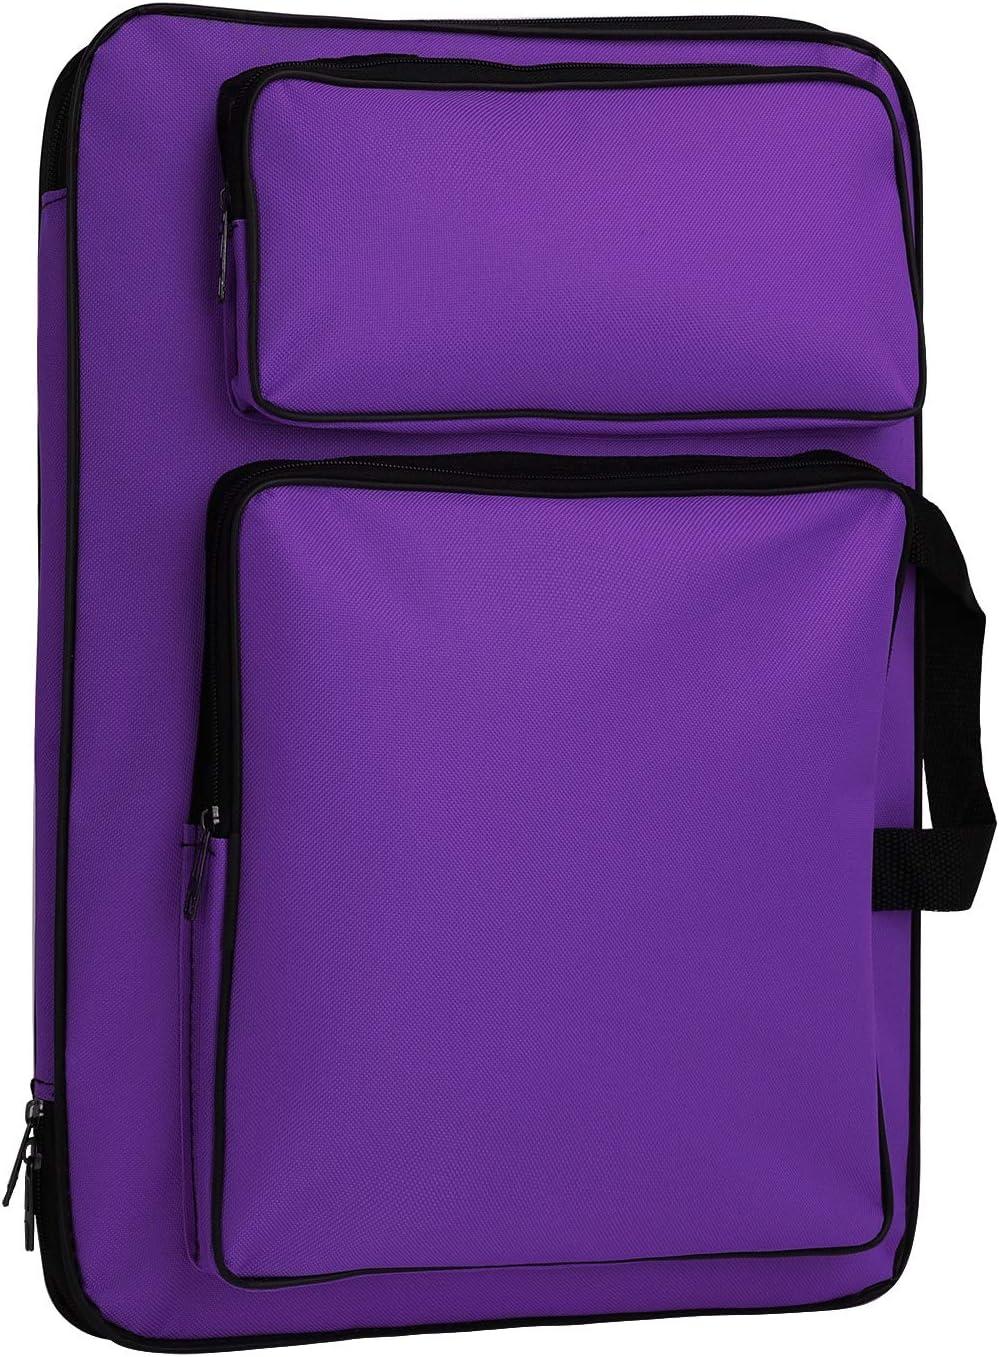 Waterproof Art//Craft Supplies Storage Tote Bag Artist Travel Portfolio Carrying Bag Case Painting Box Large Messenger Bag for Painting Brushes Pencils Palette Paints Sketchbook